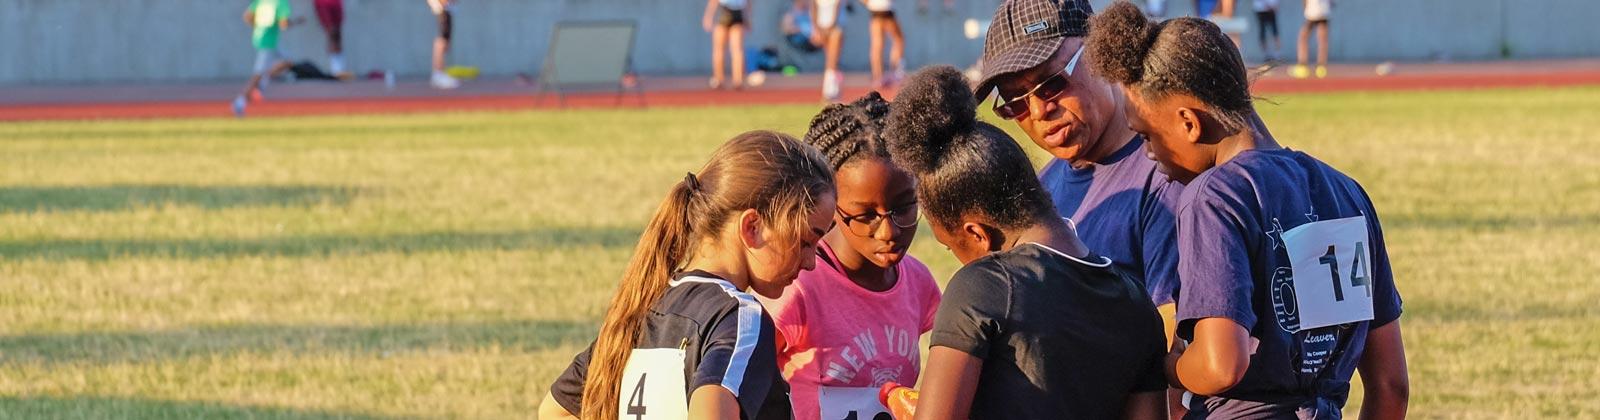 Track Academy Team Huddle